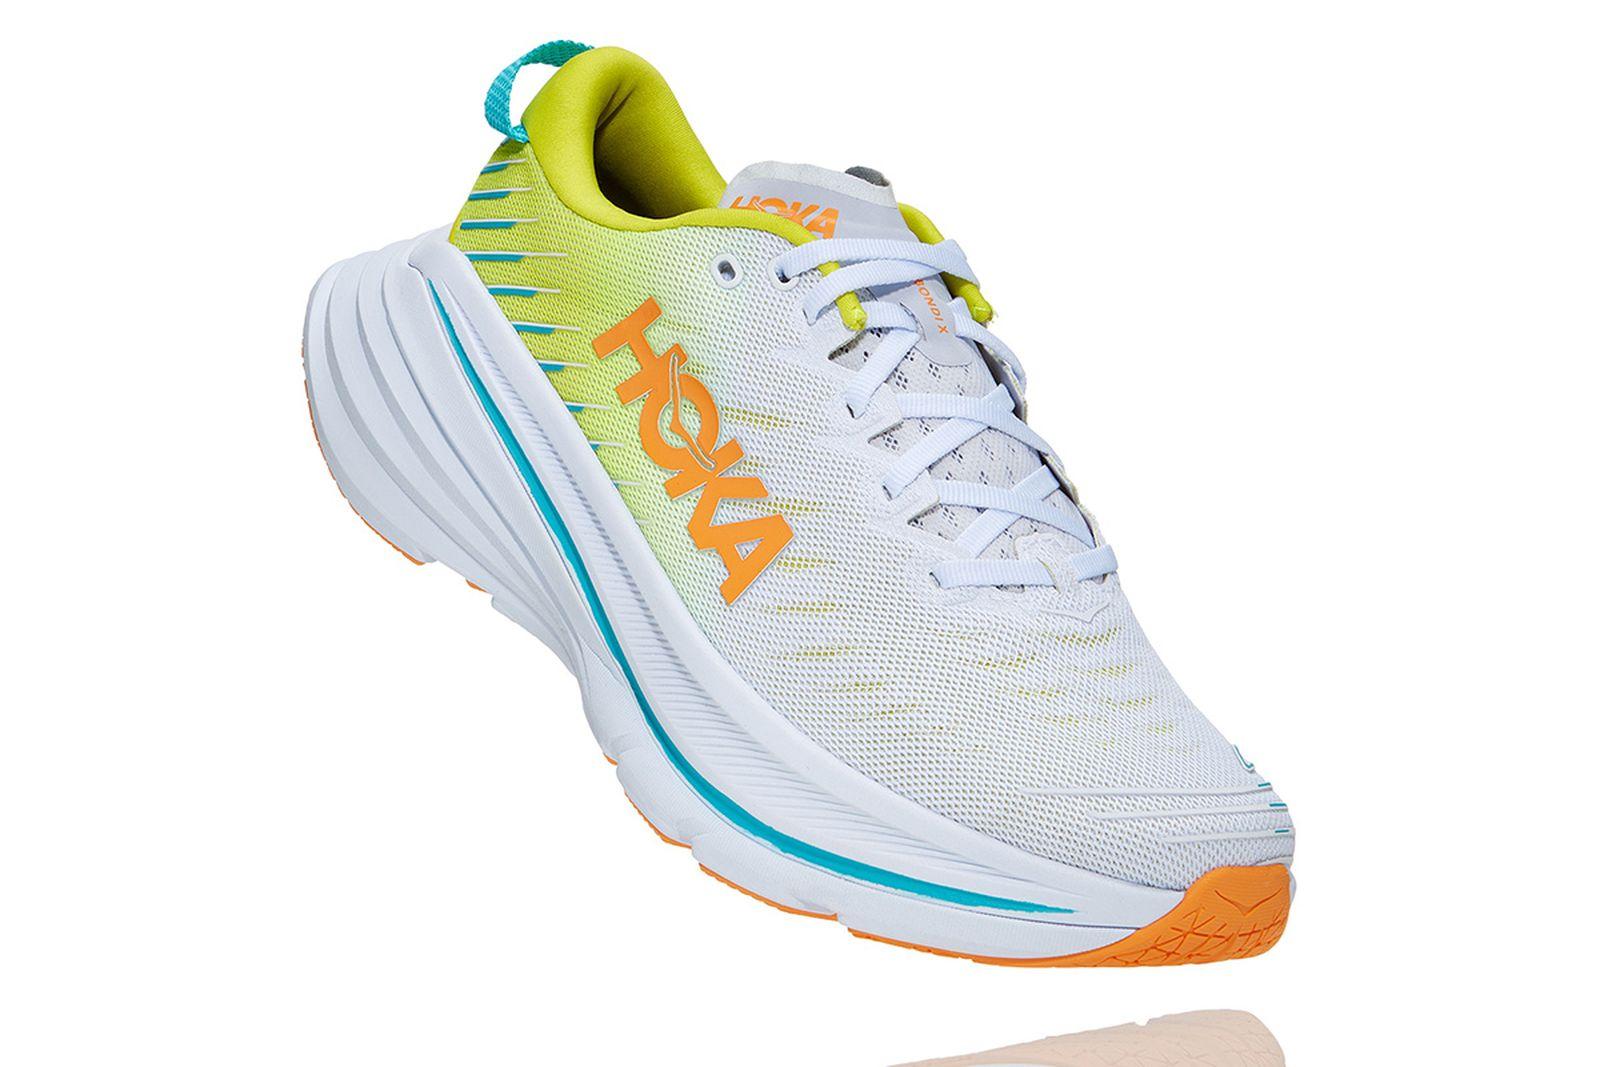 hoka-one-one-bonda-x-release-date-info-price-01